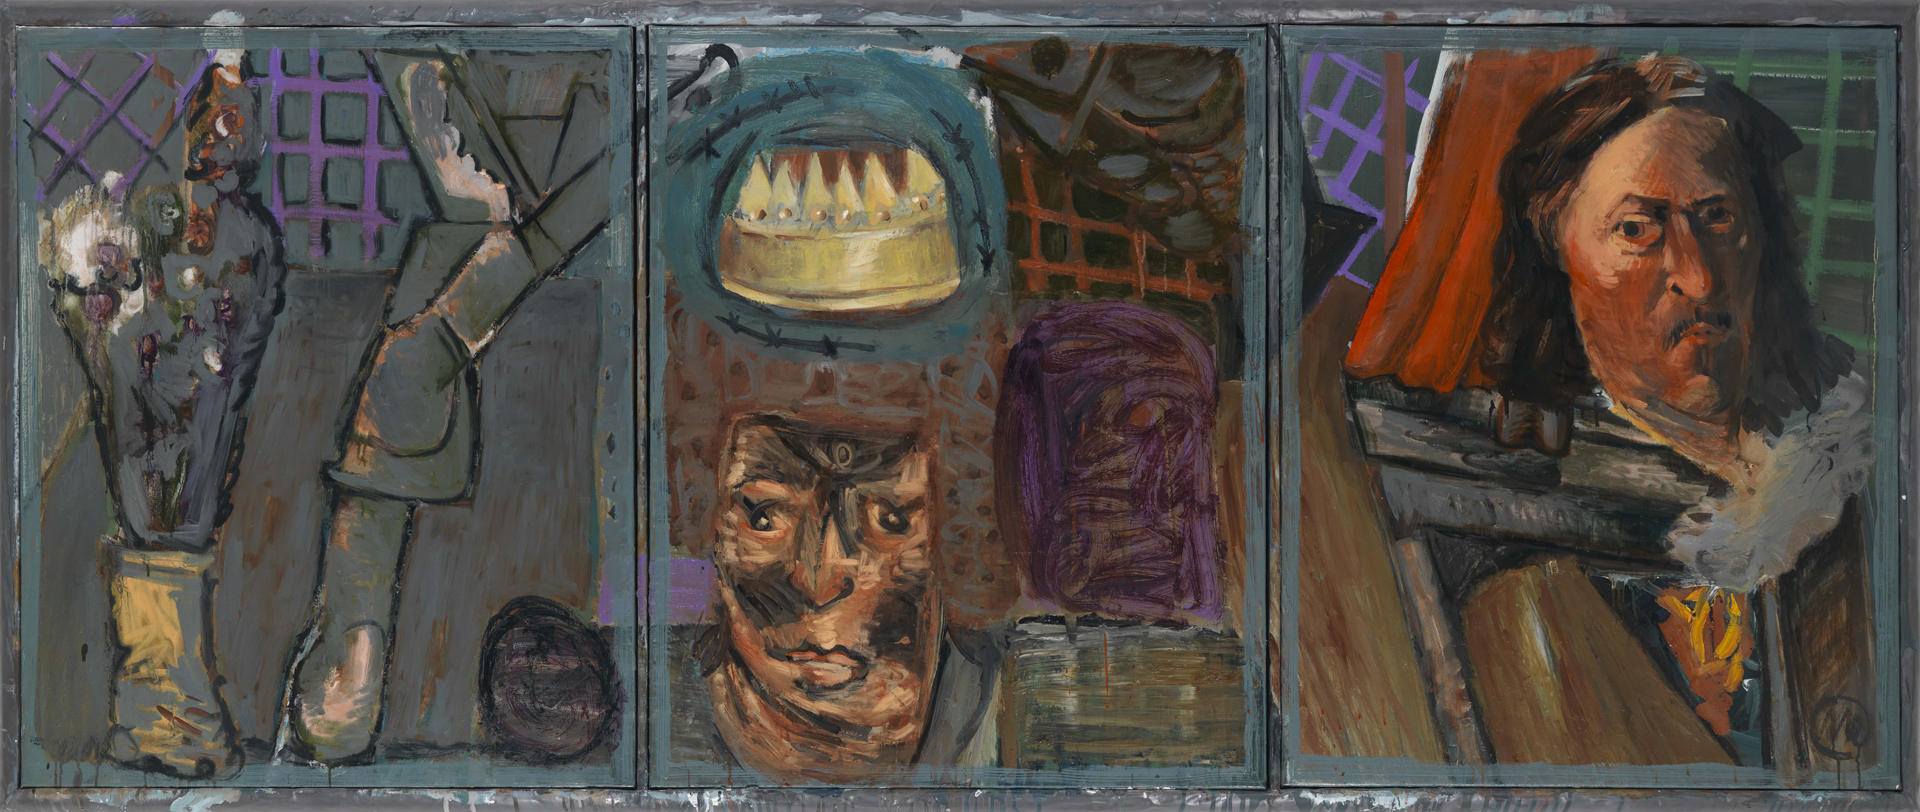 Markus Lüpertz, Triptychon: König, William Shakespeare, 1988, Öl auf Leinwand, 100 x 247 cm